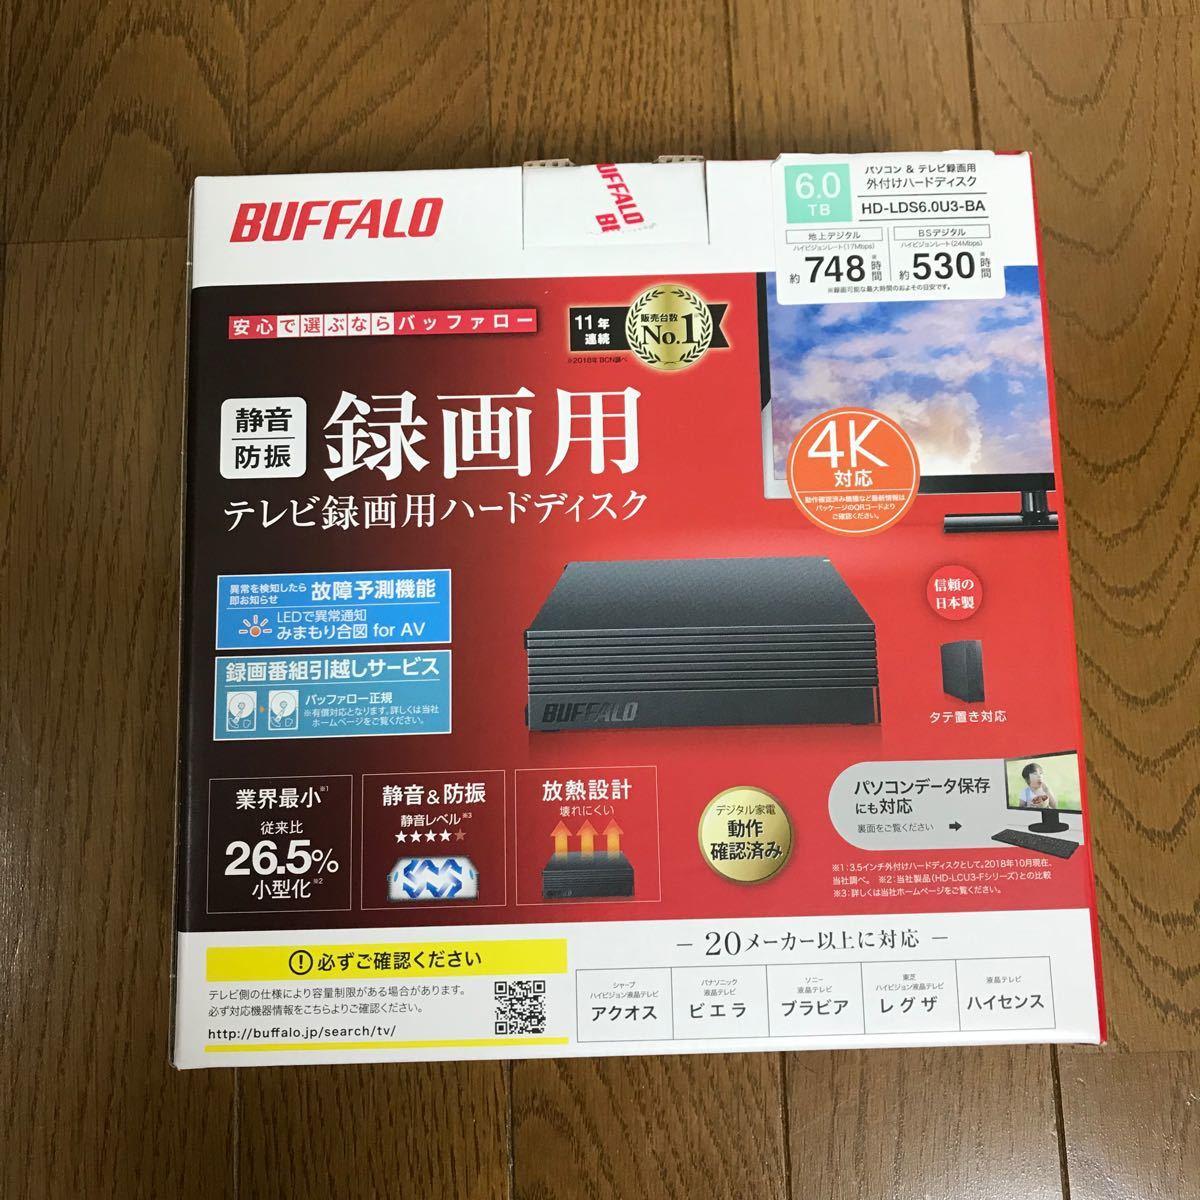 BUFFALO バッファロー 6TB外付けハードディスク HD-LDS6.0U3-BA 新品未開封!【3/6(土)限定特別価格!】